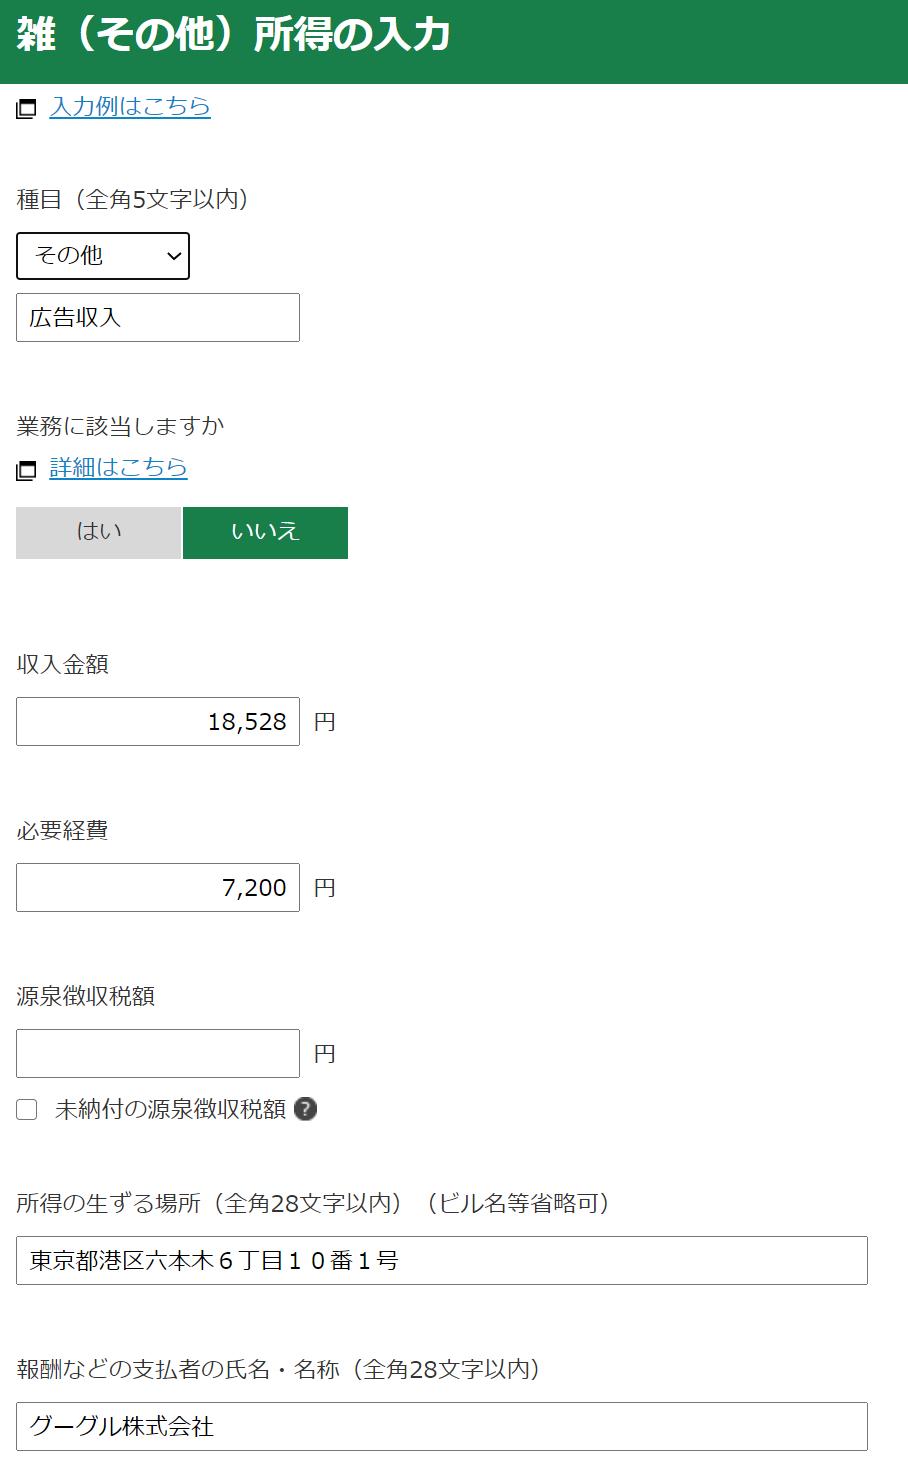 f:id:hodo-work:20210127203850p:plain